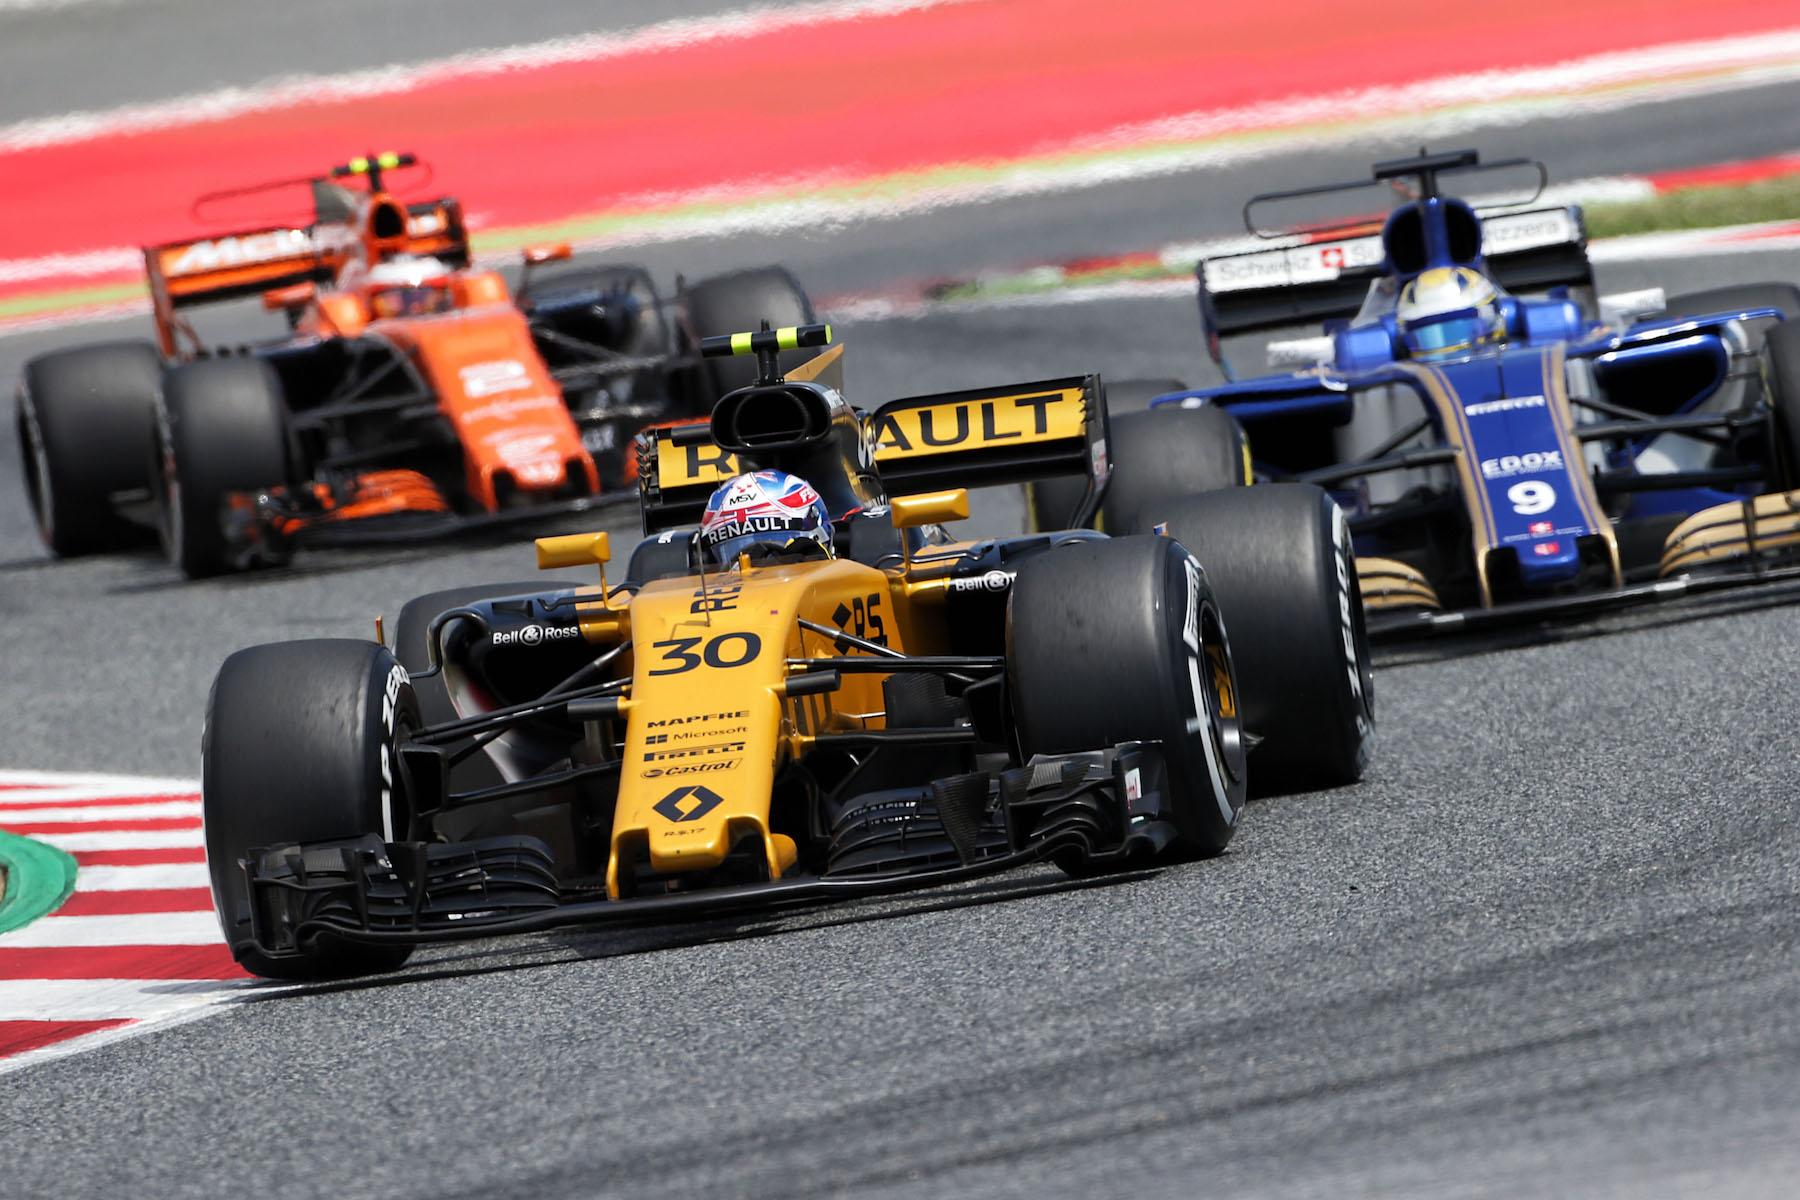 D 2017 Jolyon Palmer | Renault RS17 | 2017 Spanish GP 1 copy.jpg